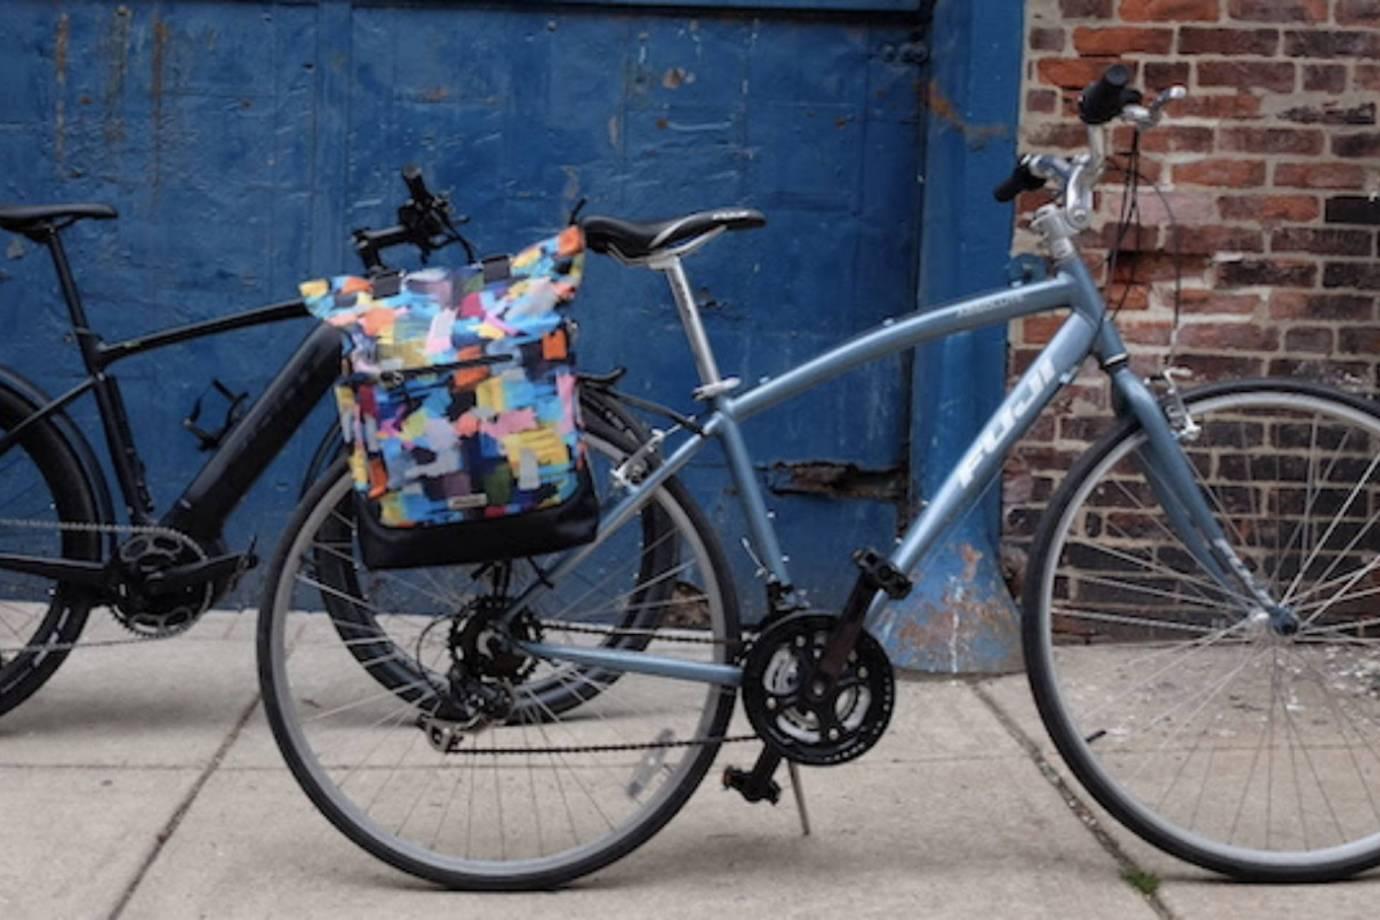 colorful pannier bike bag on women's cruiser by a blue brick wall